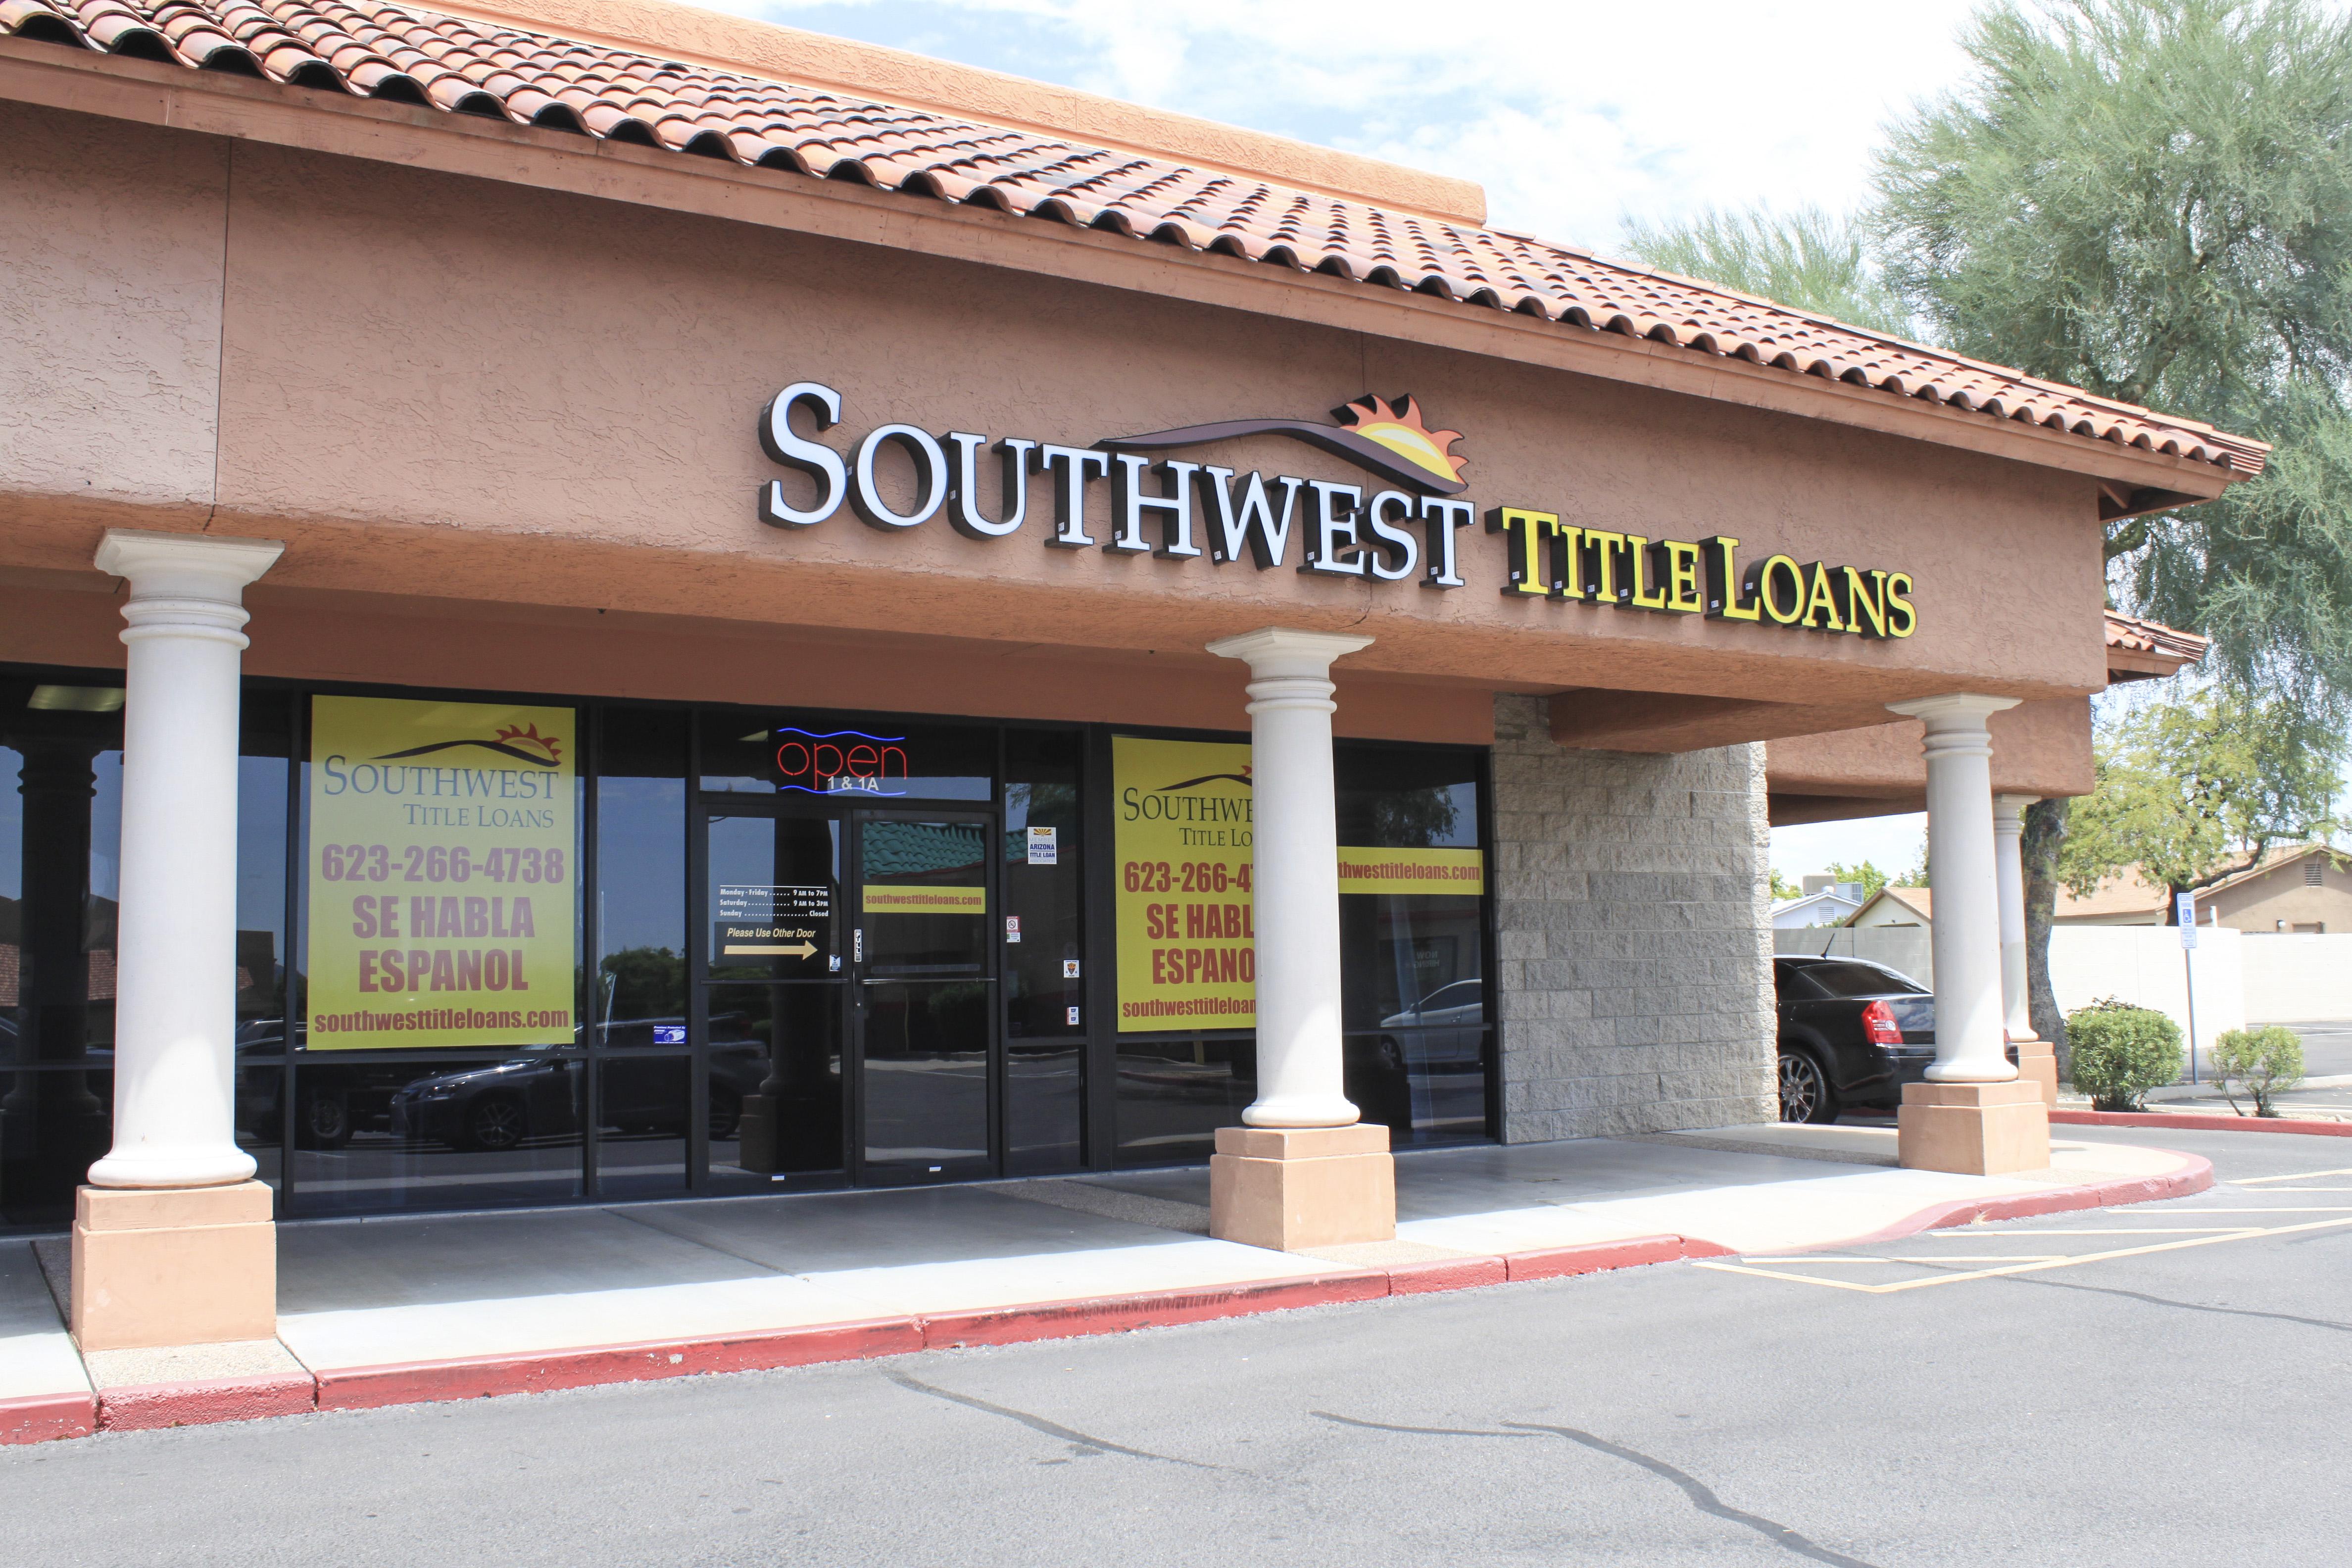 Southwest Title Loans image 0